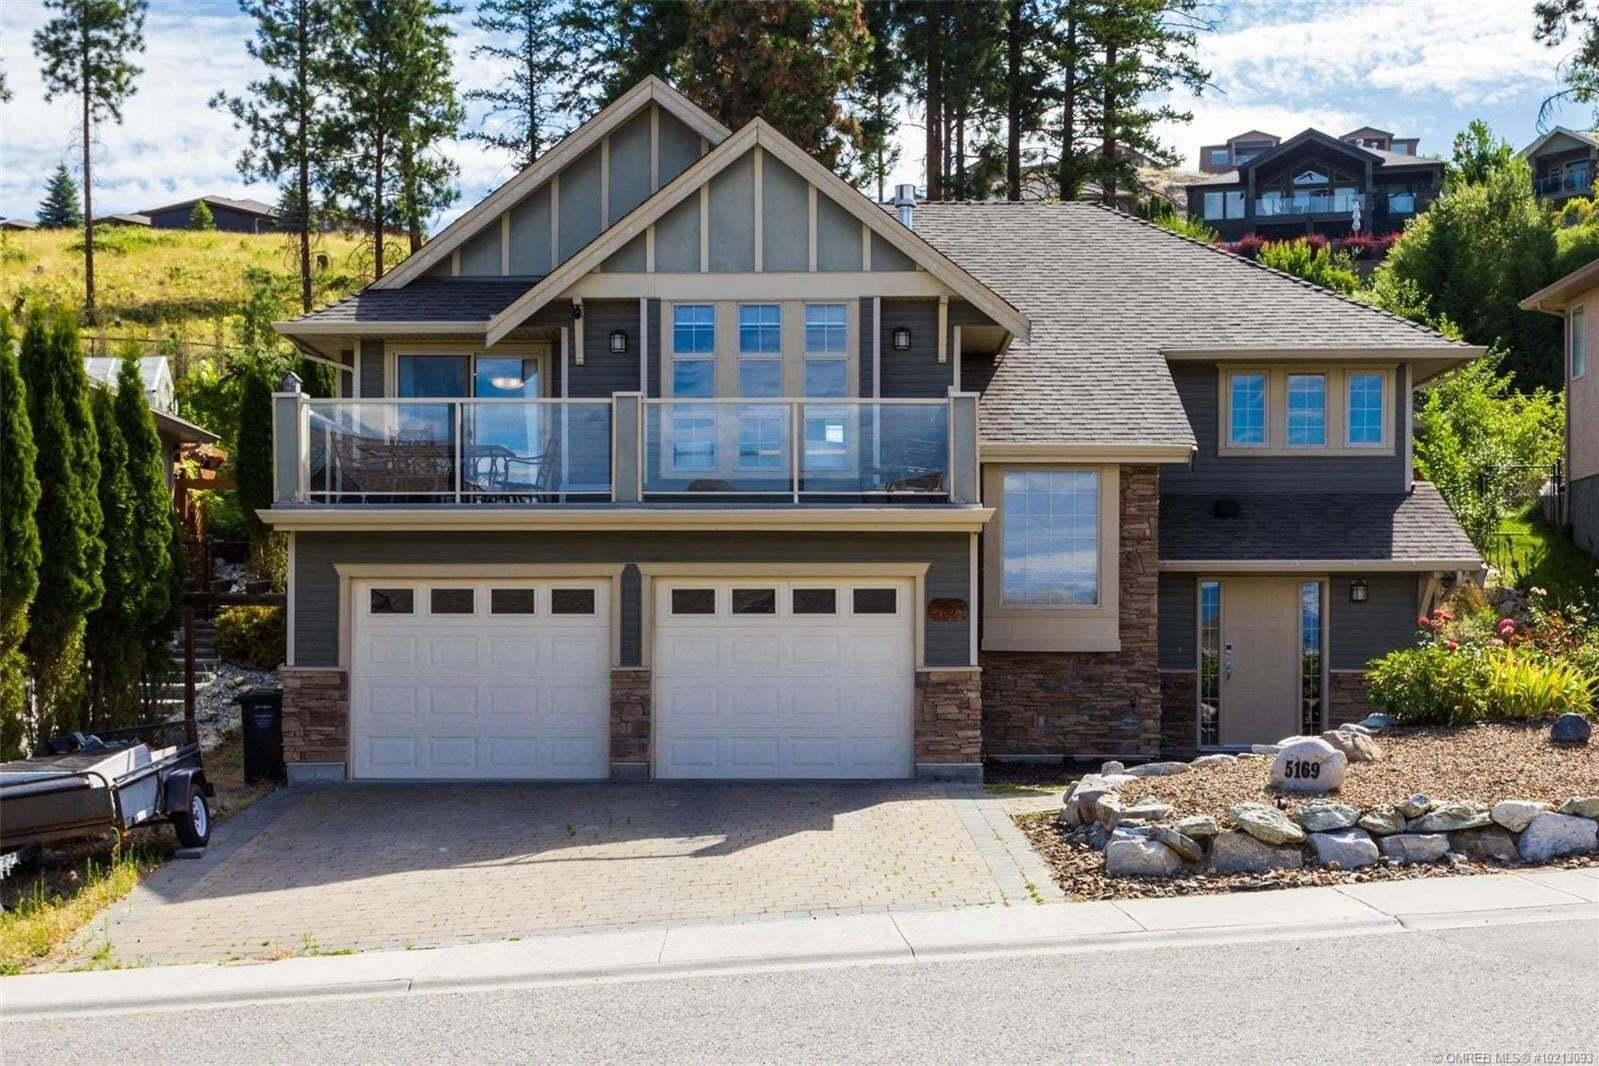 House for sale at 5169 South Ridge Dr Kelowna British Columbia - MLS: 10213093